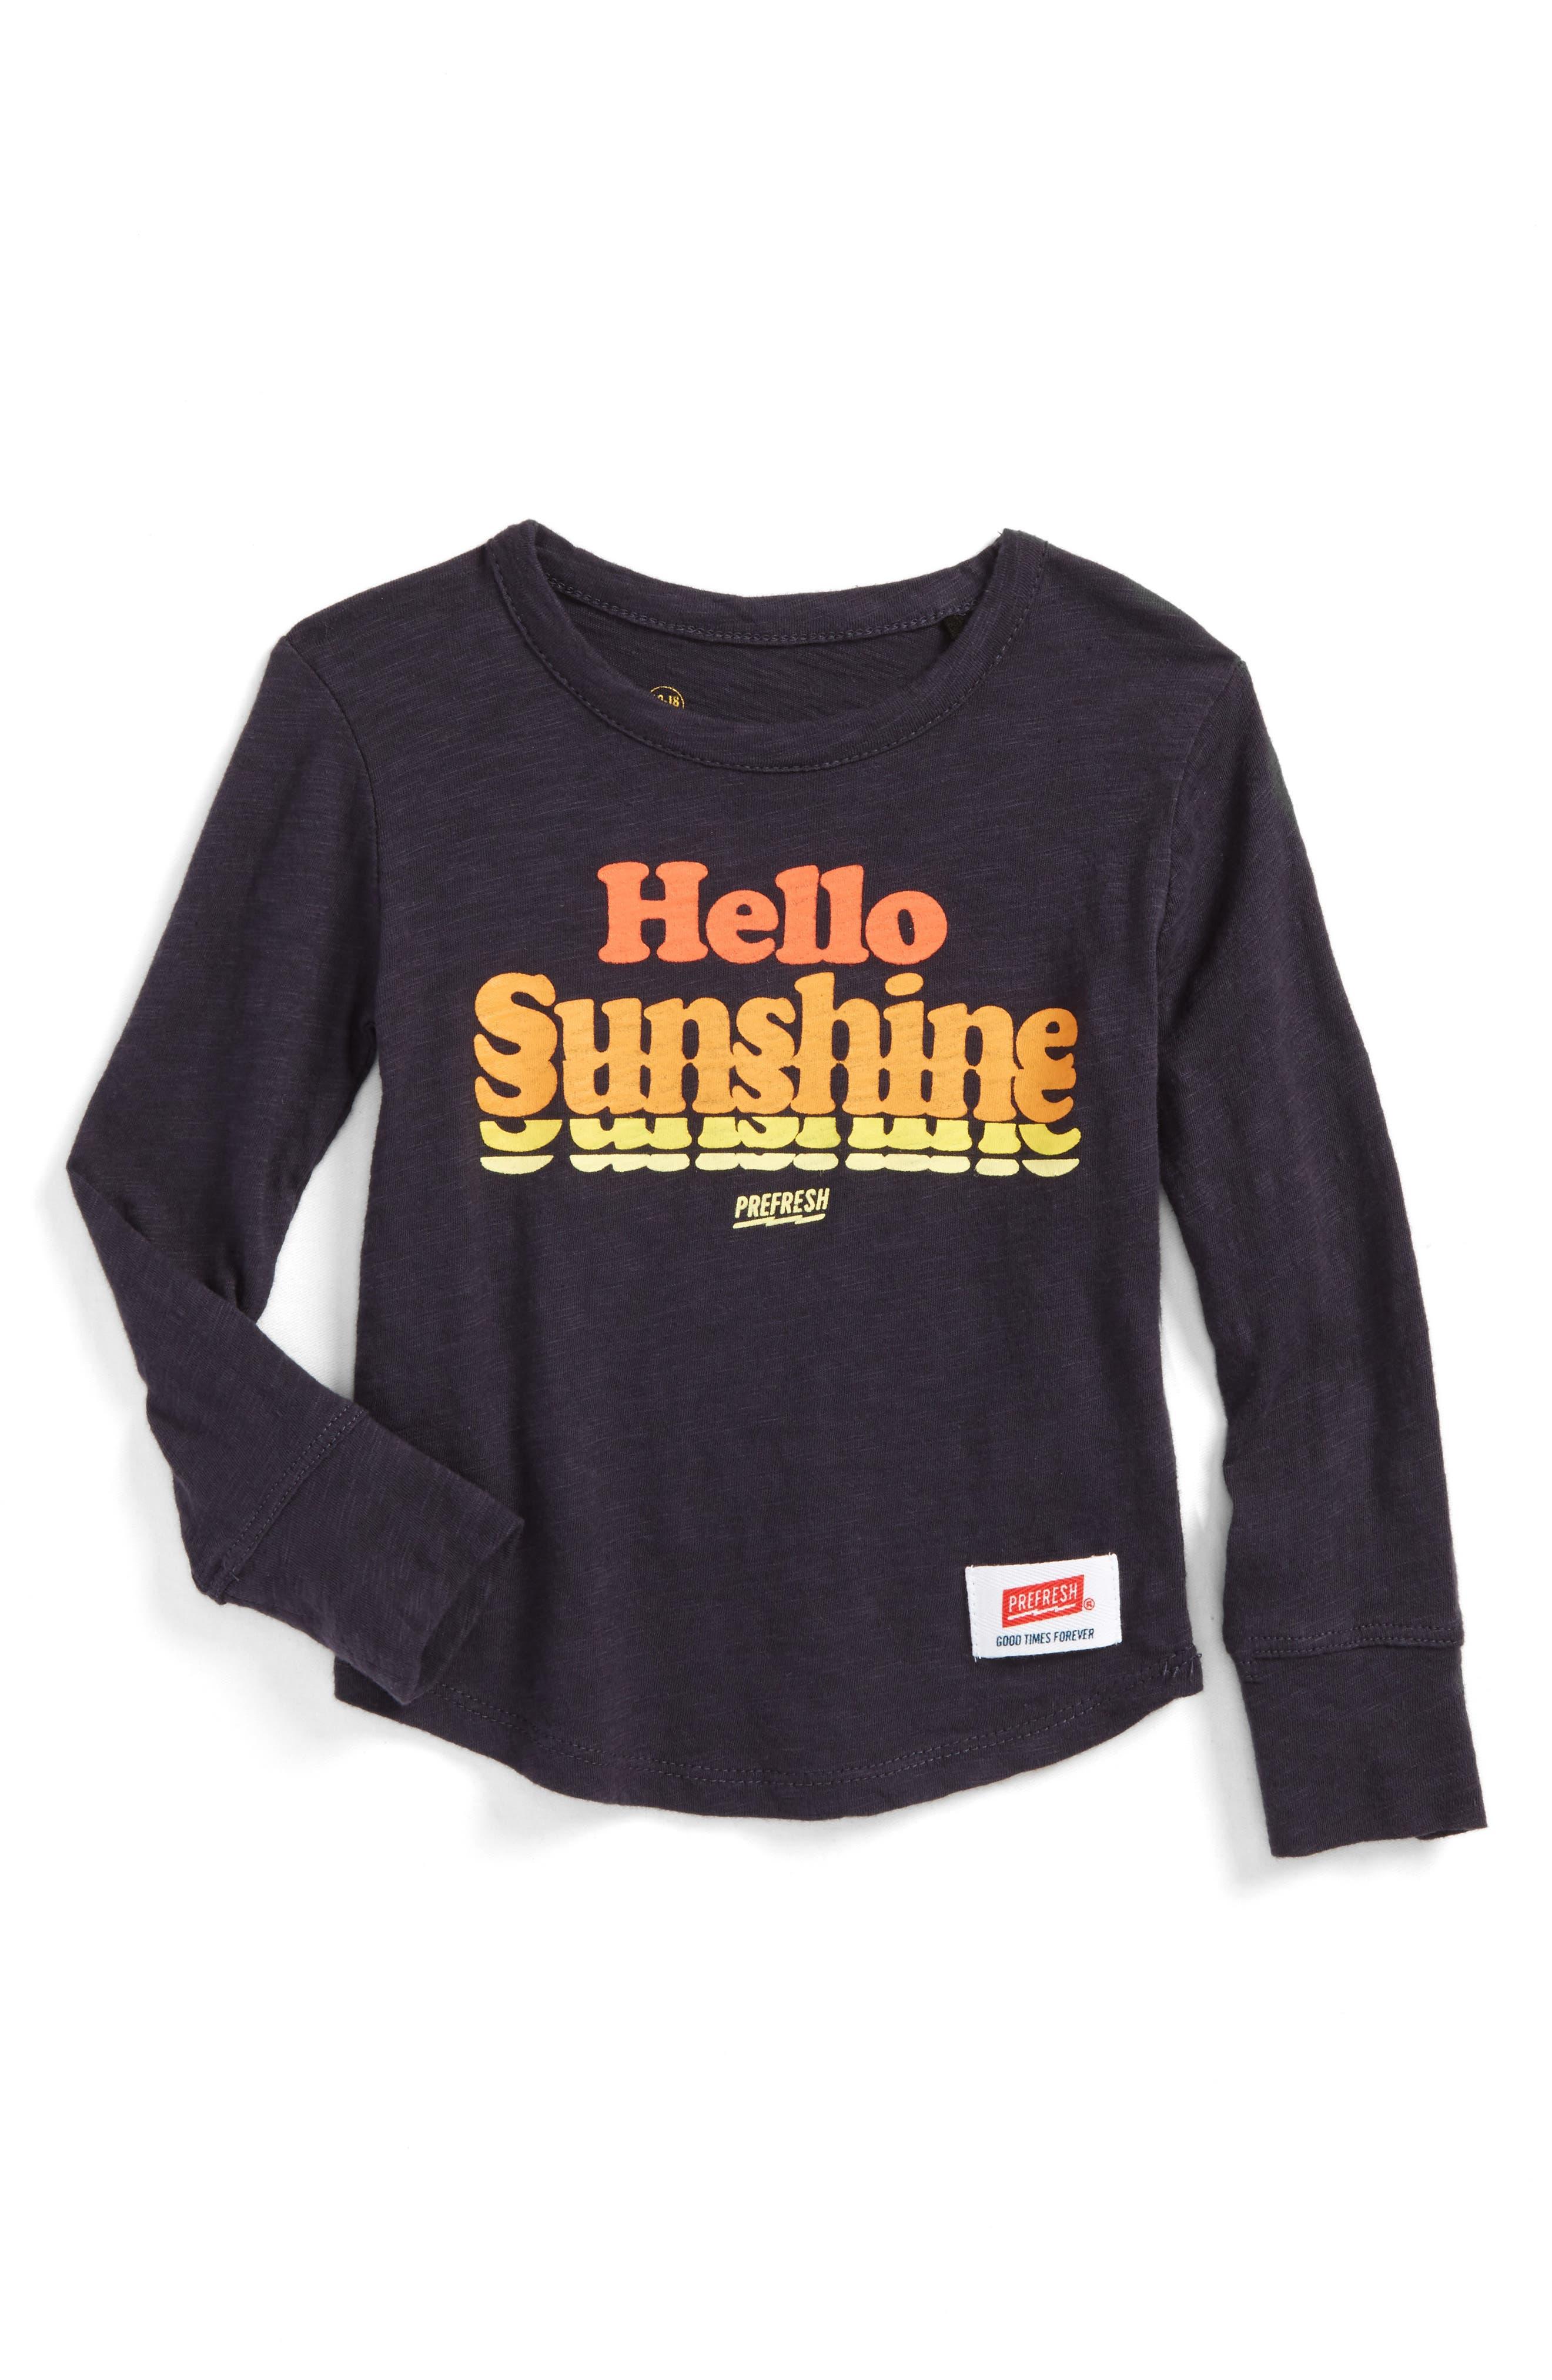 Main Image - Prefresh Hello Sunshine Graphic T-Shirt (Baby Boys)